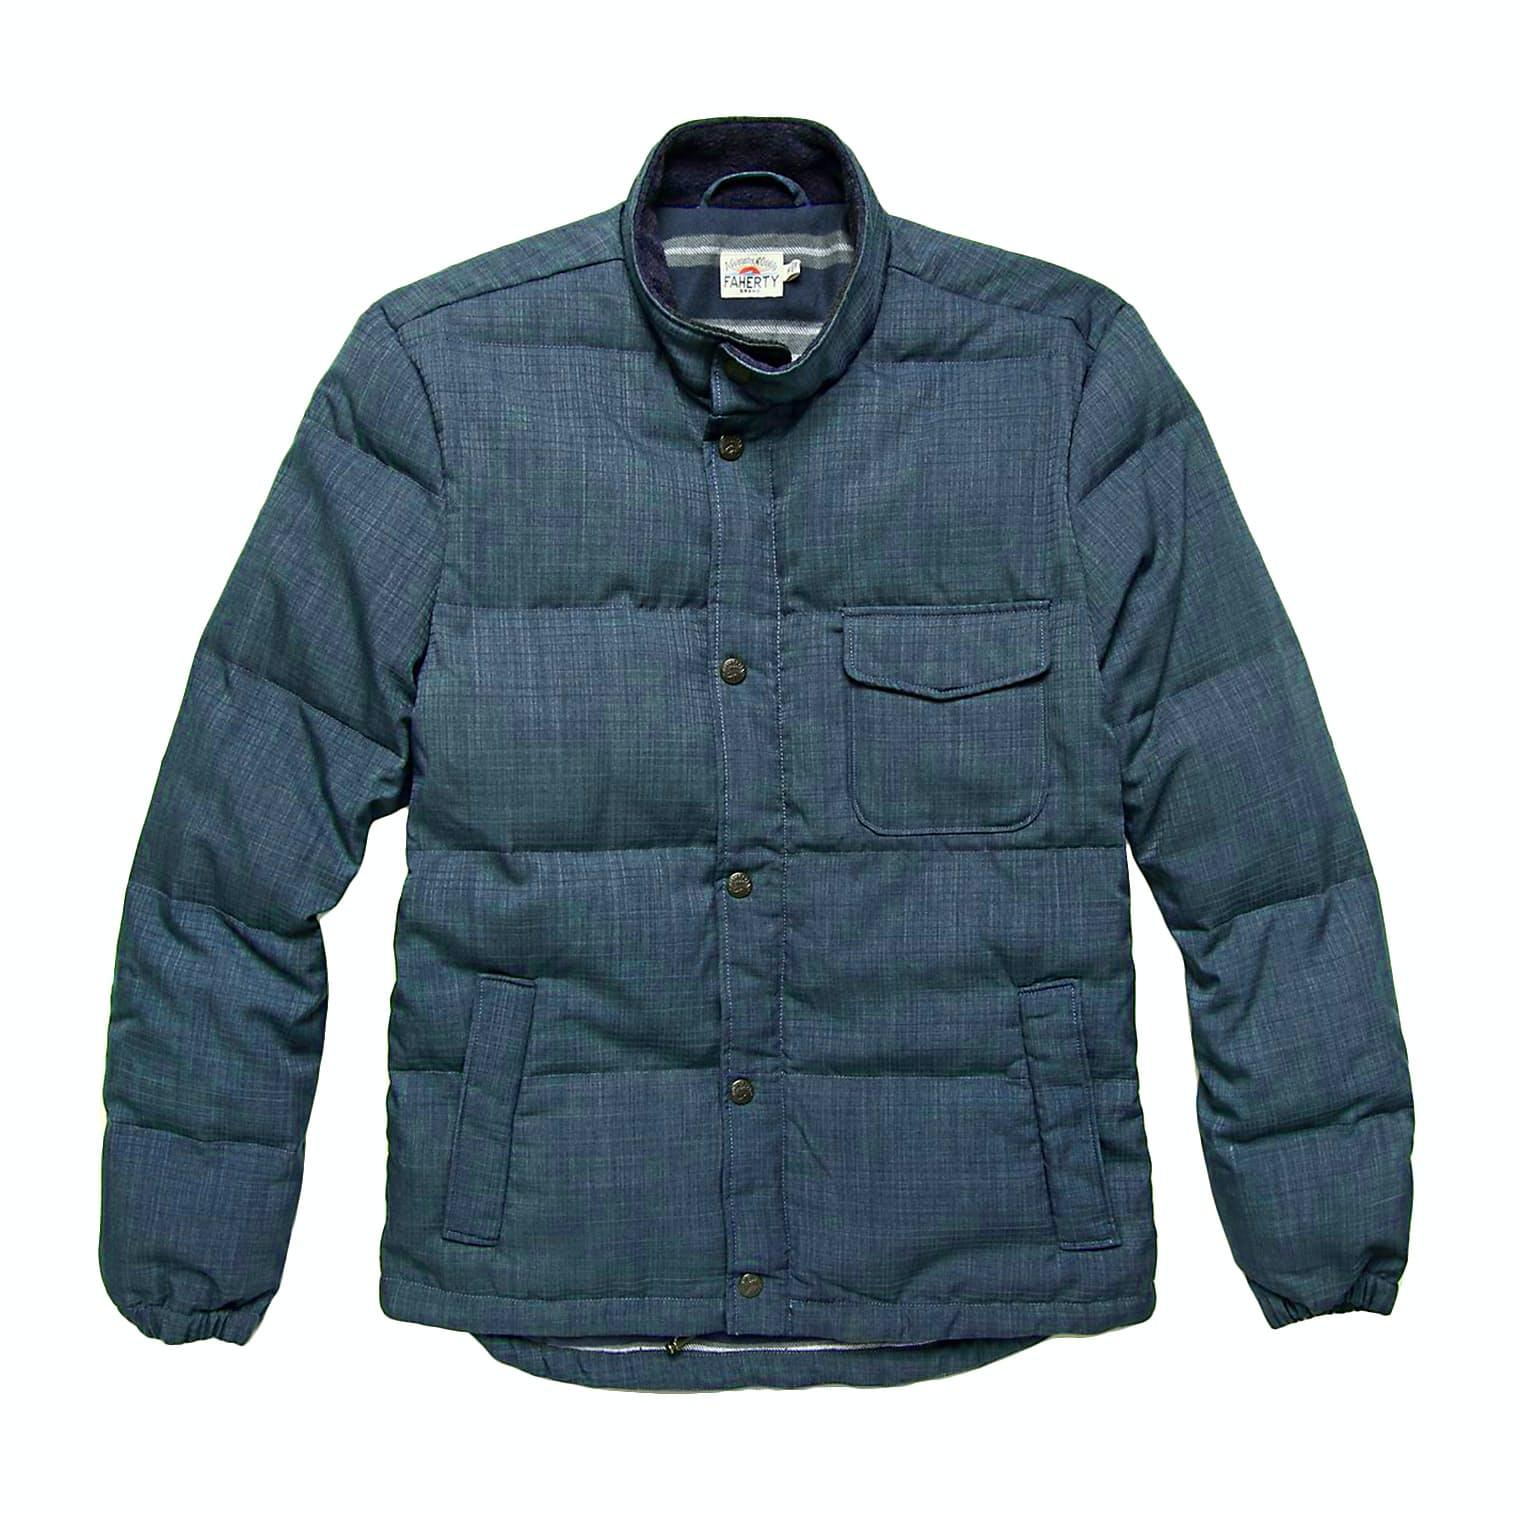 Xcj1c9qlau faherty brand down jacket 0 original